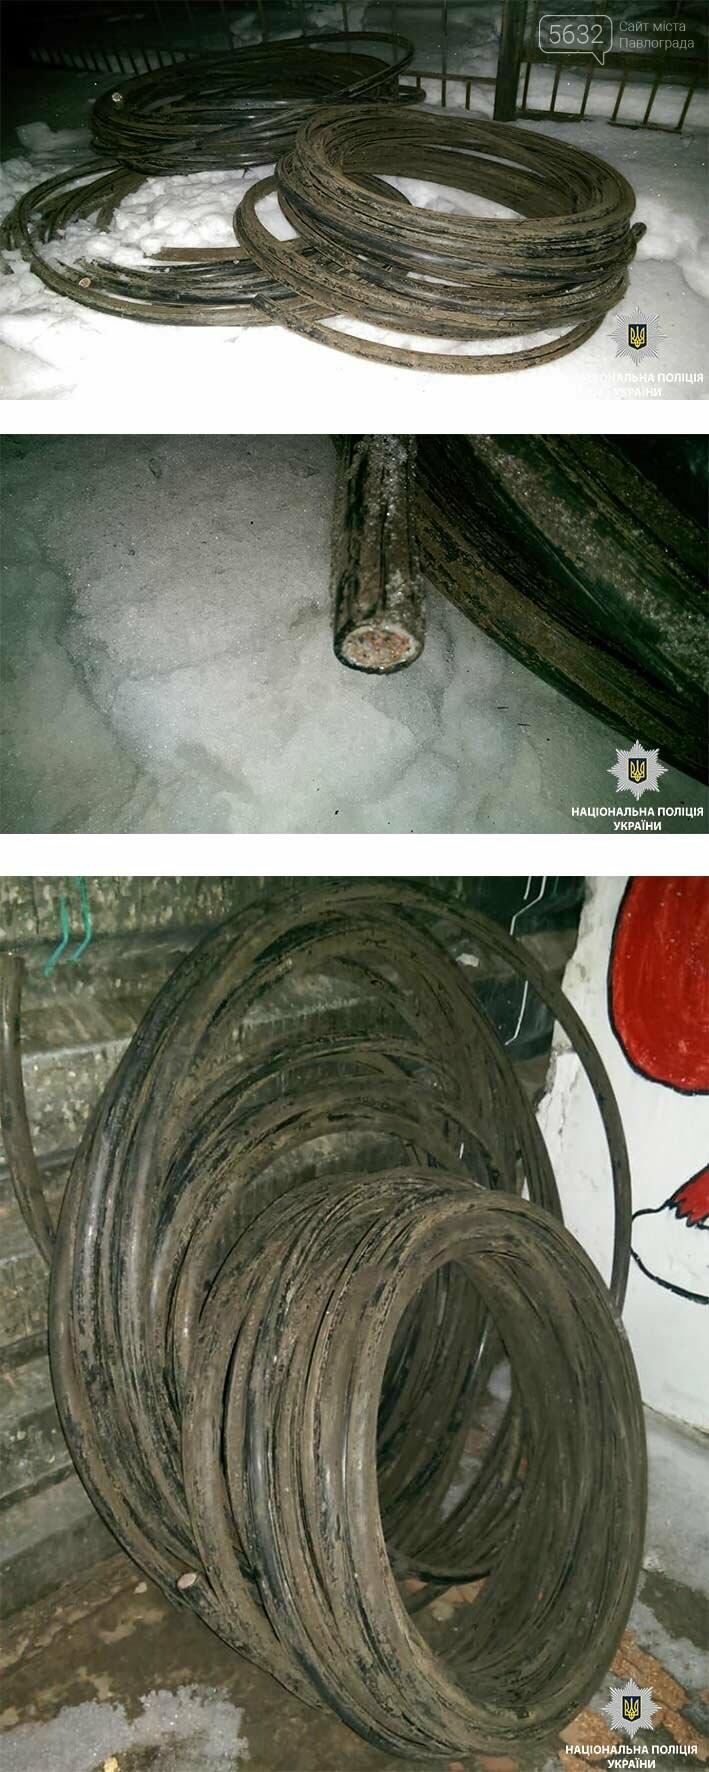 Павлоградські поліцеські затримали крадія кабелю, фото-1